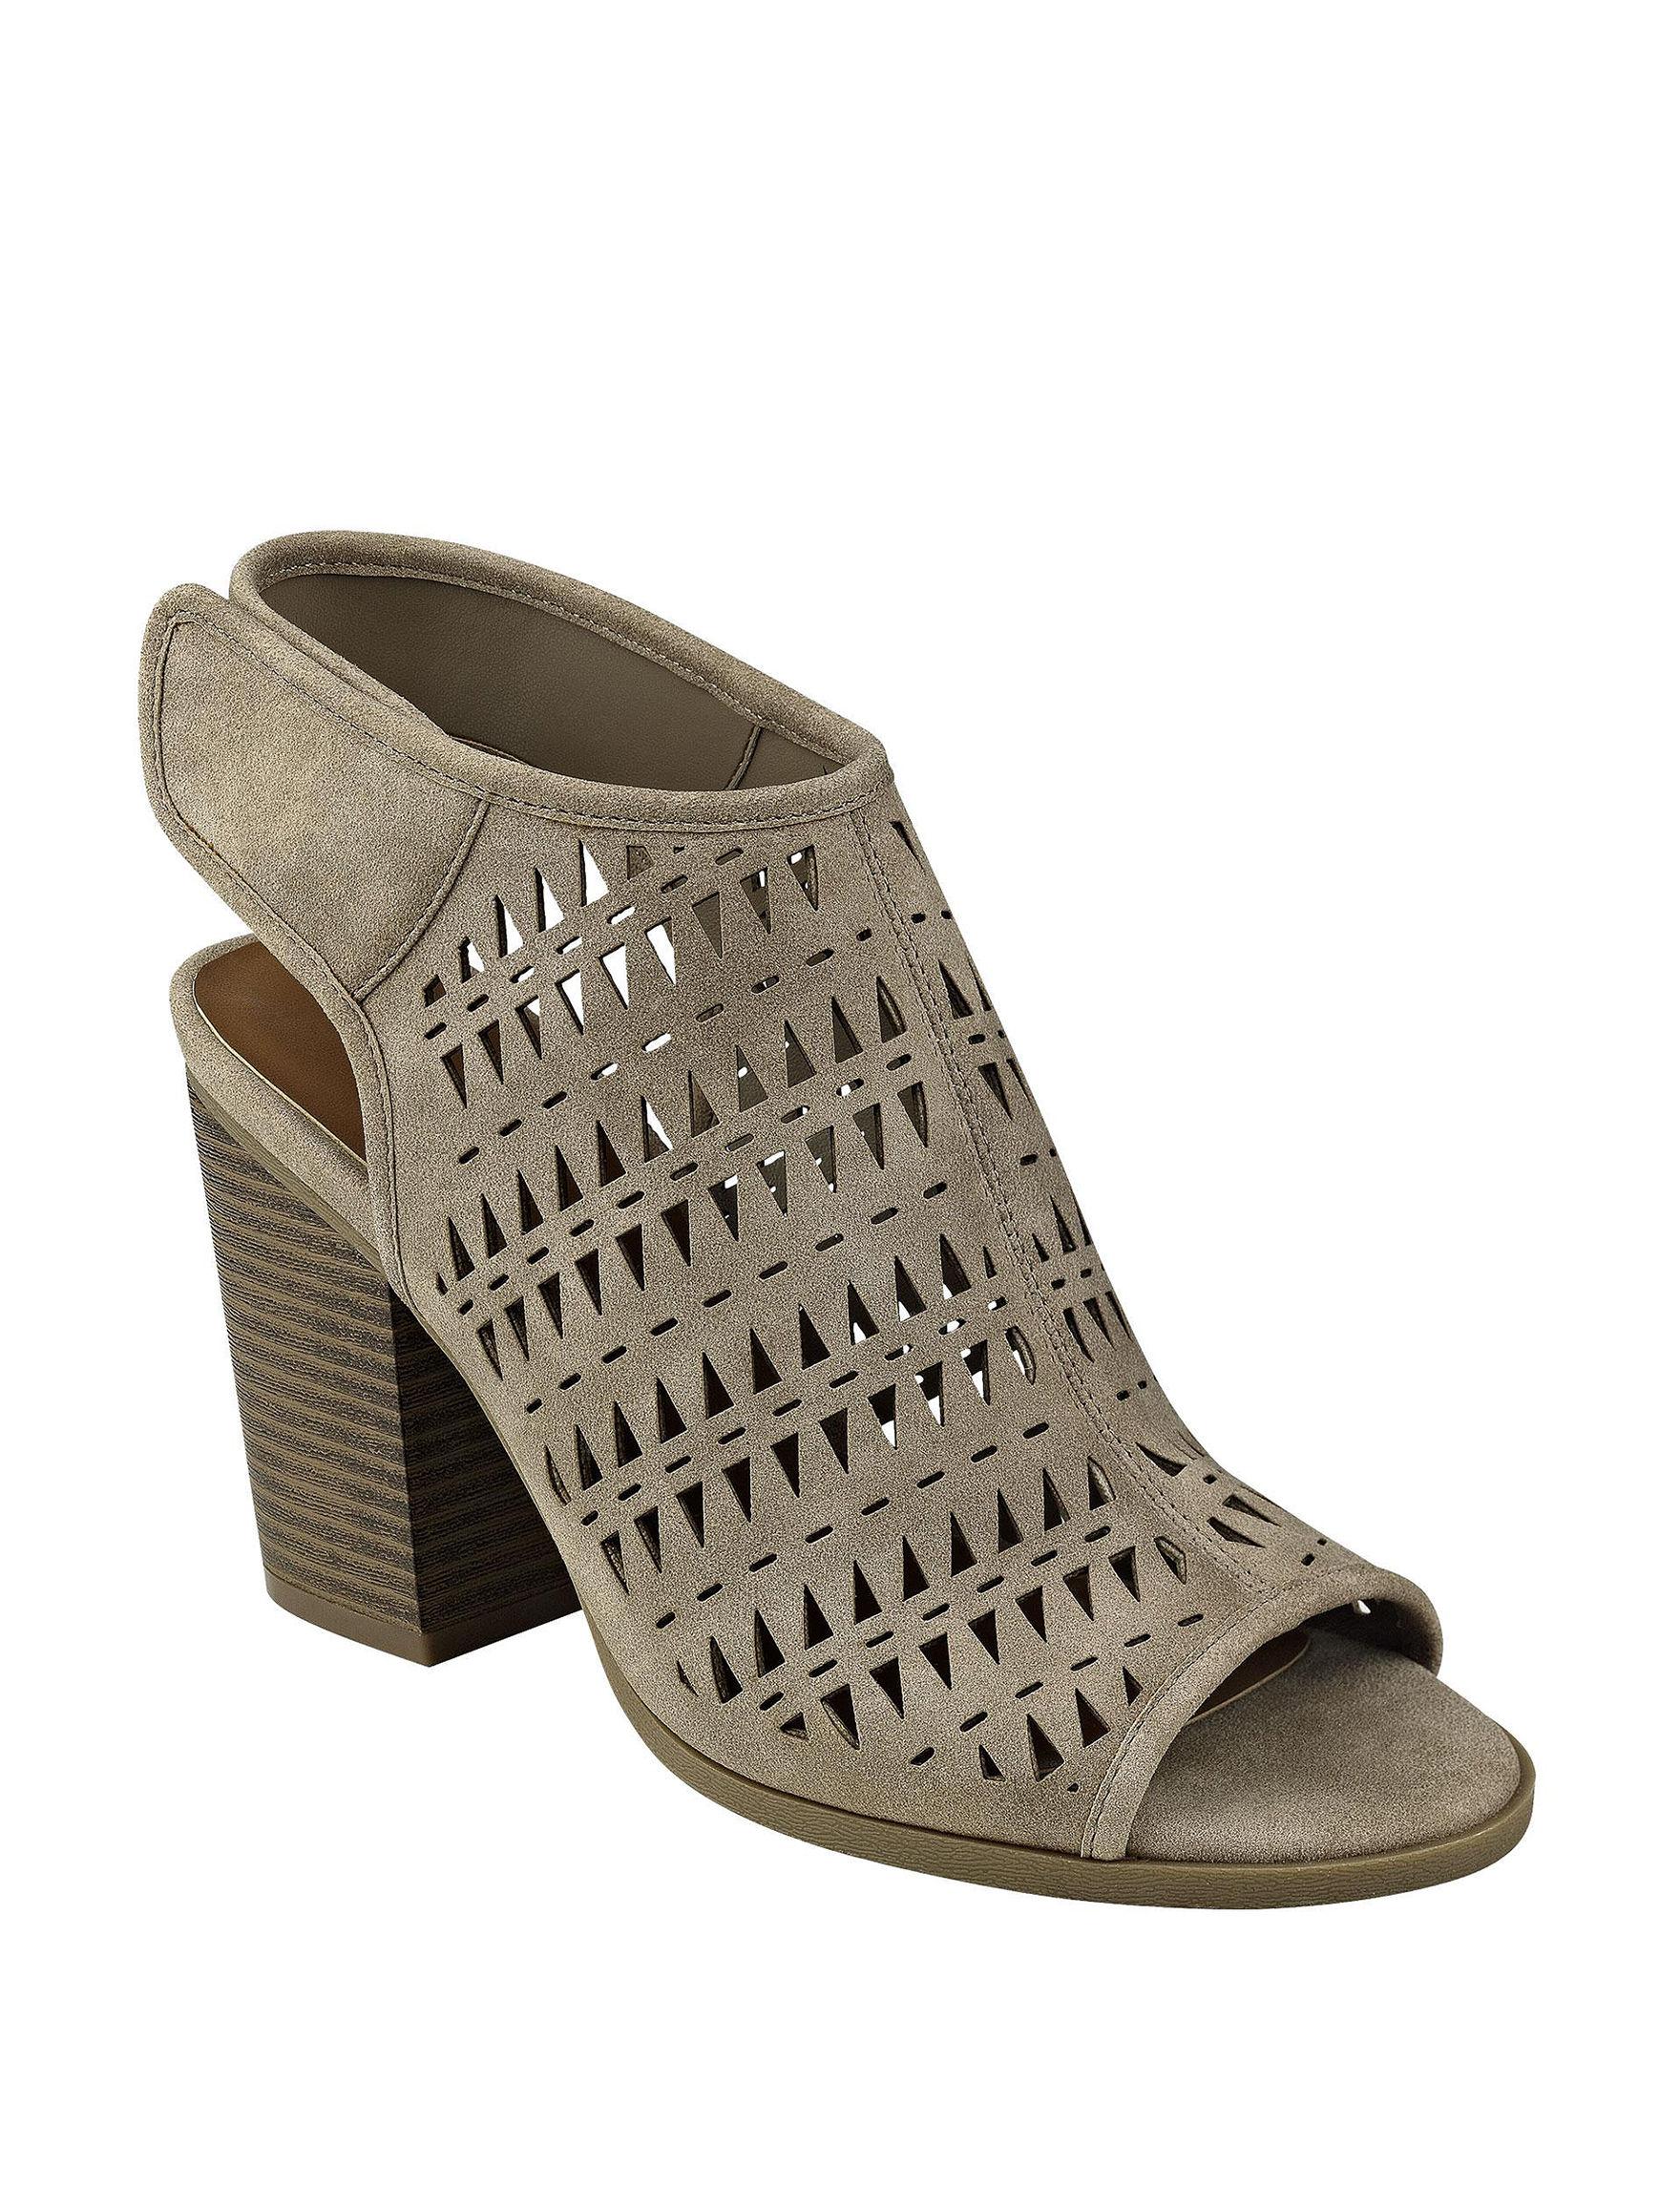 Indigo Rd. Taupe Heeled Sandals Peep Toe